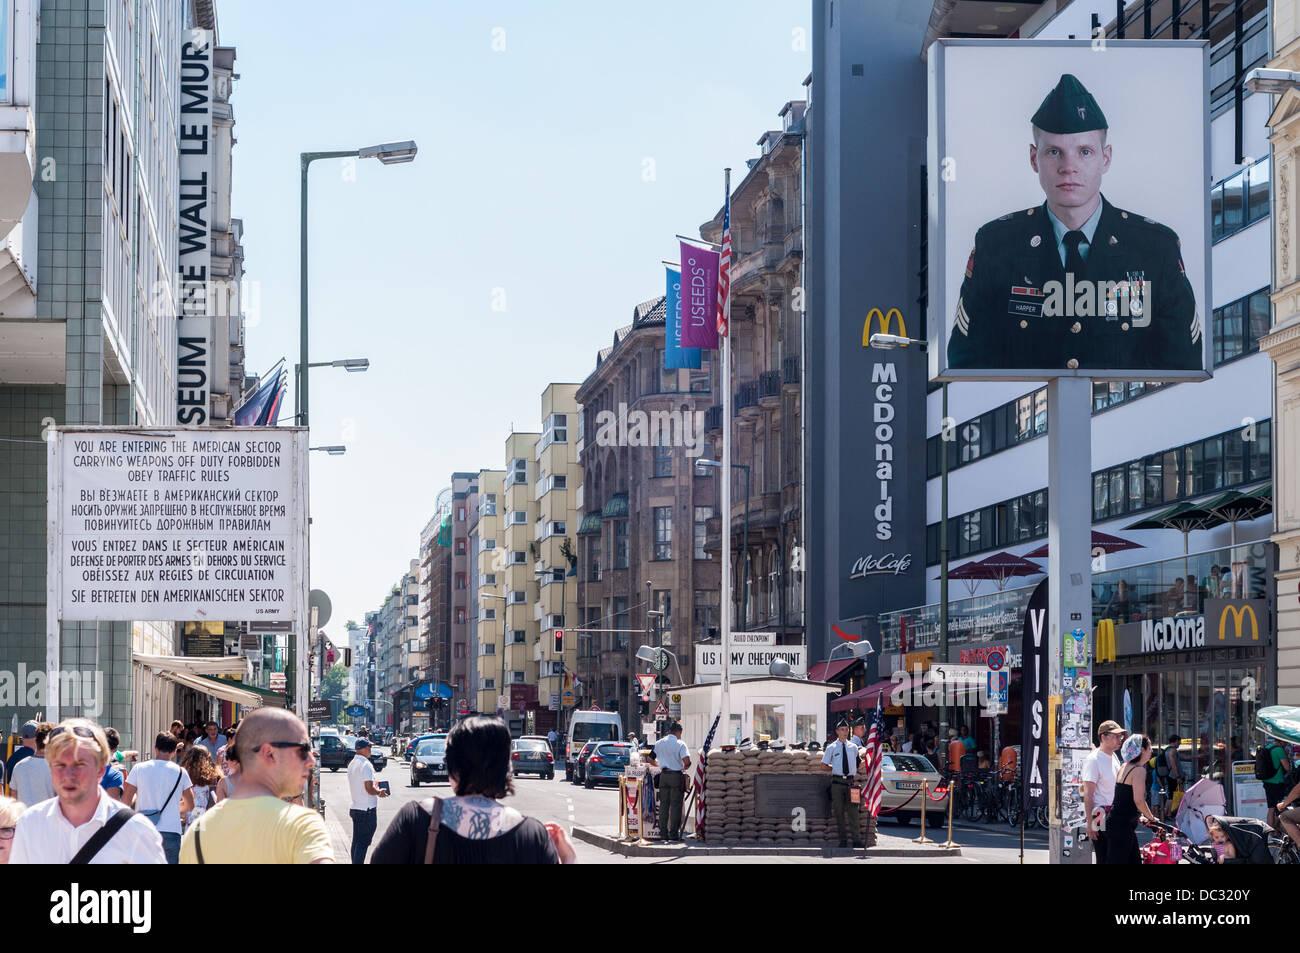 US Army Checkpoint Charlie Berlin Germany landmark Stock Photo